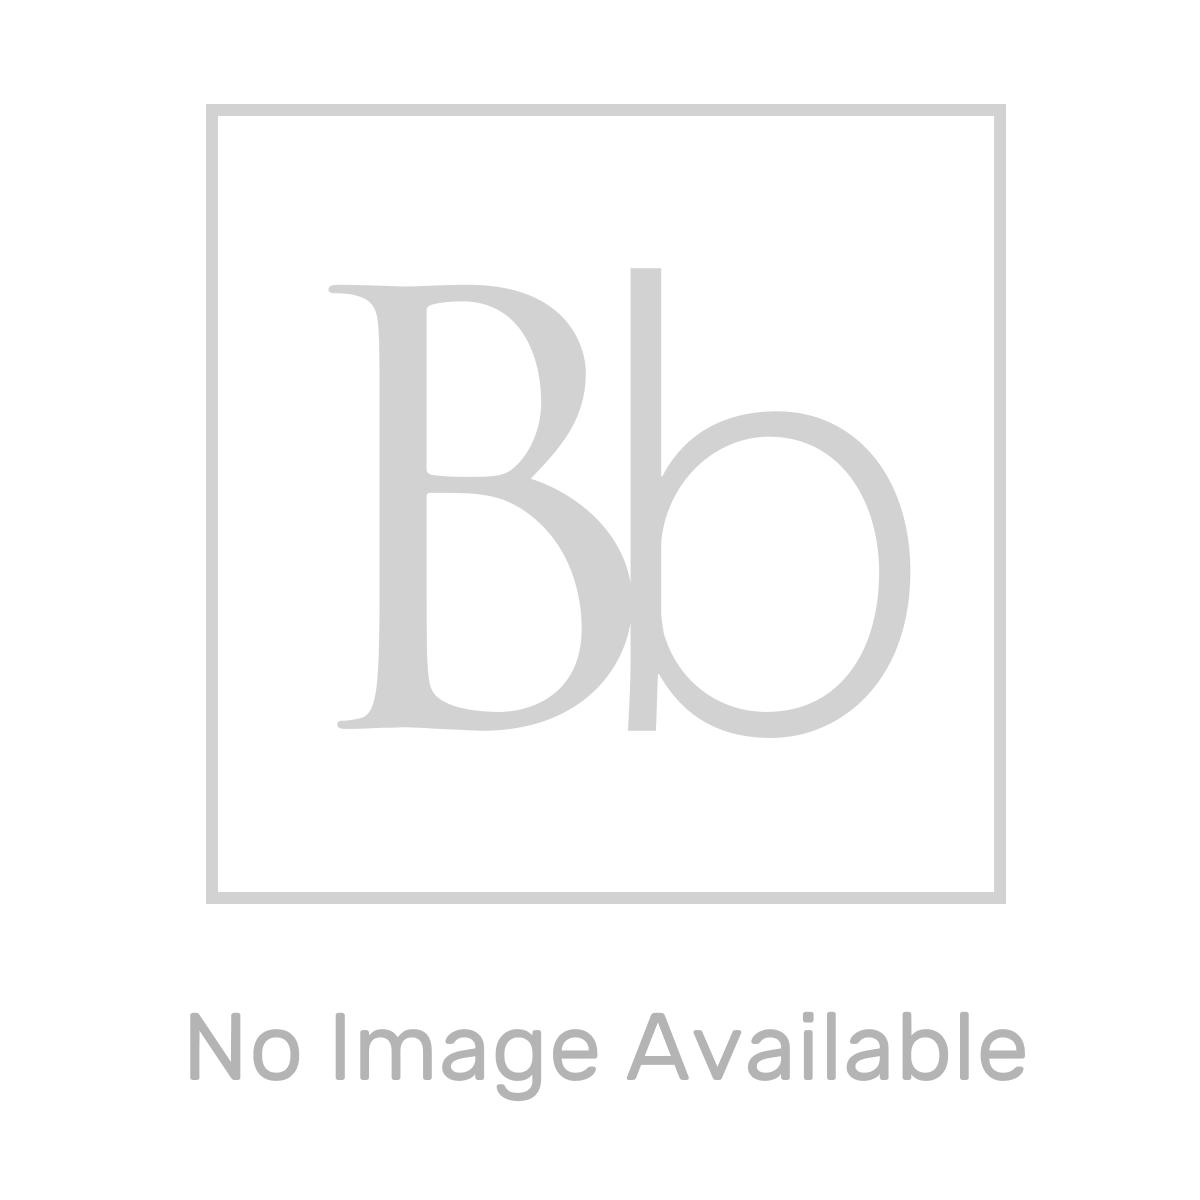 Moods Super Strength White End Bath Panel 700mm